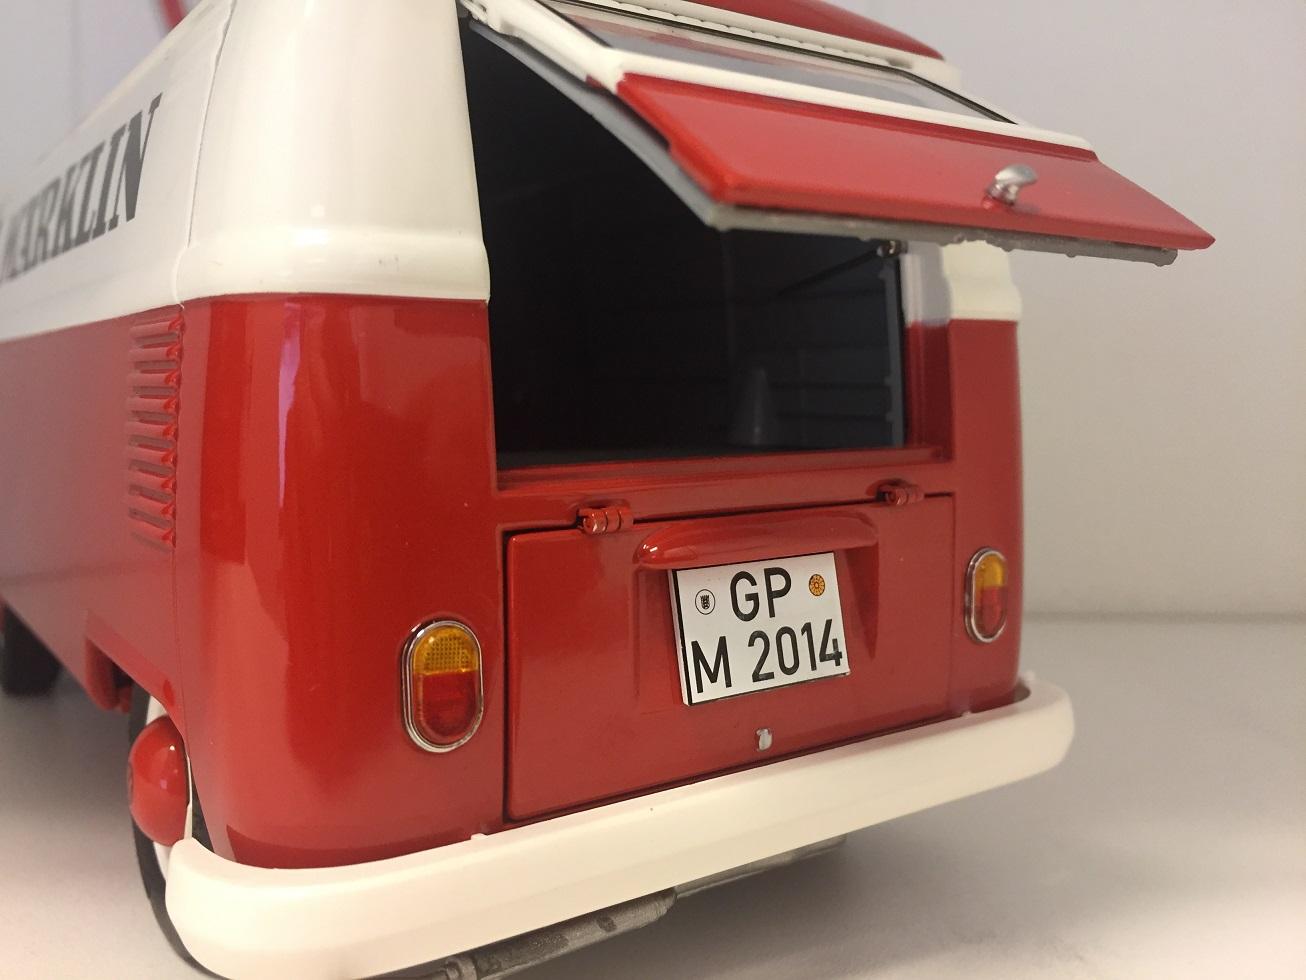 vr modelauto 39 s volkswagen t1 kastenwagen 1 18. Black Bedroom Furniture Sets. Home Design Ideas